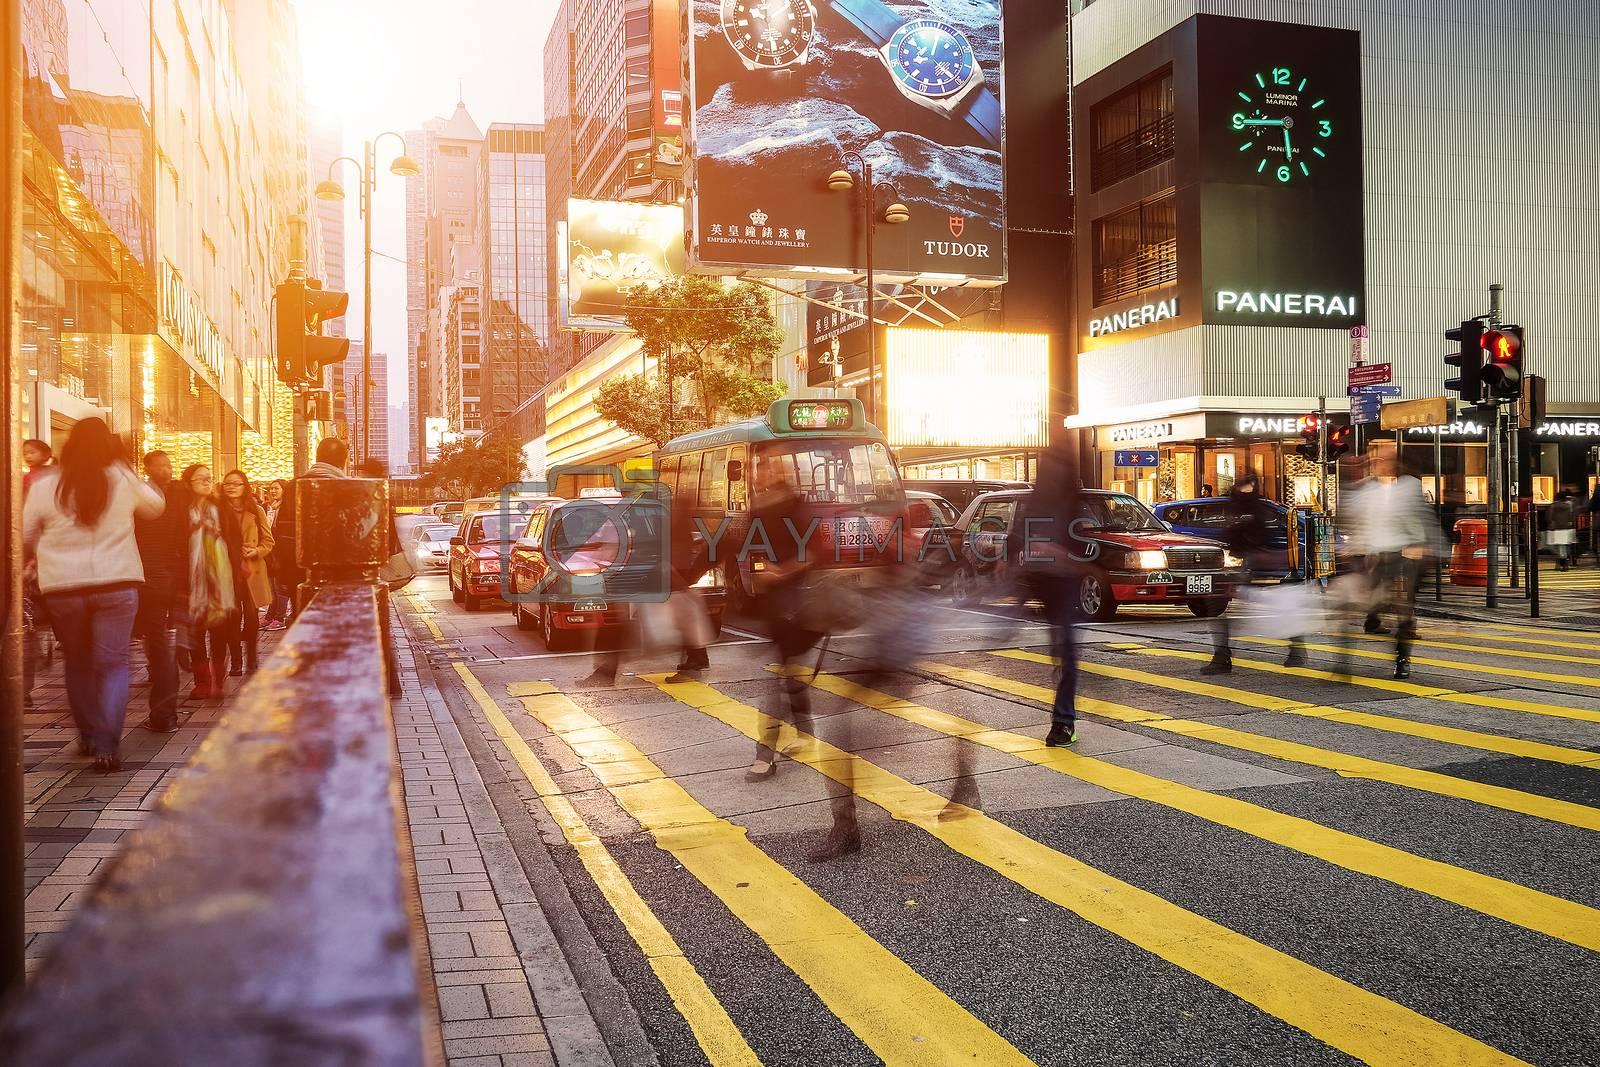 HONG KONG - JANUARY 14: People walking across Road, Causeway Bay in front of a big department store at Daylight. Hong Kong January 14, 2016